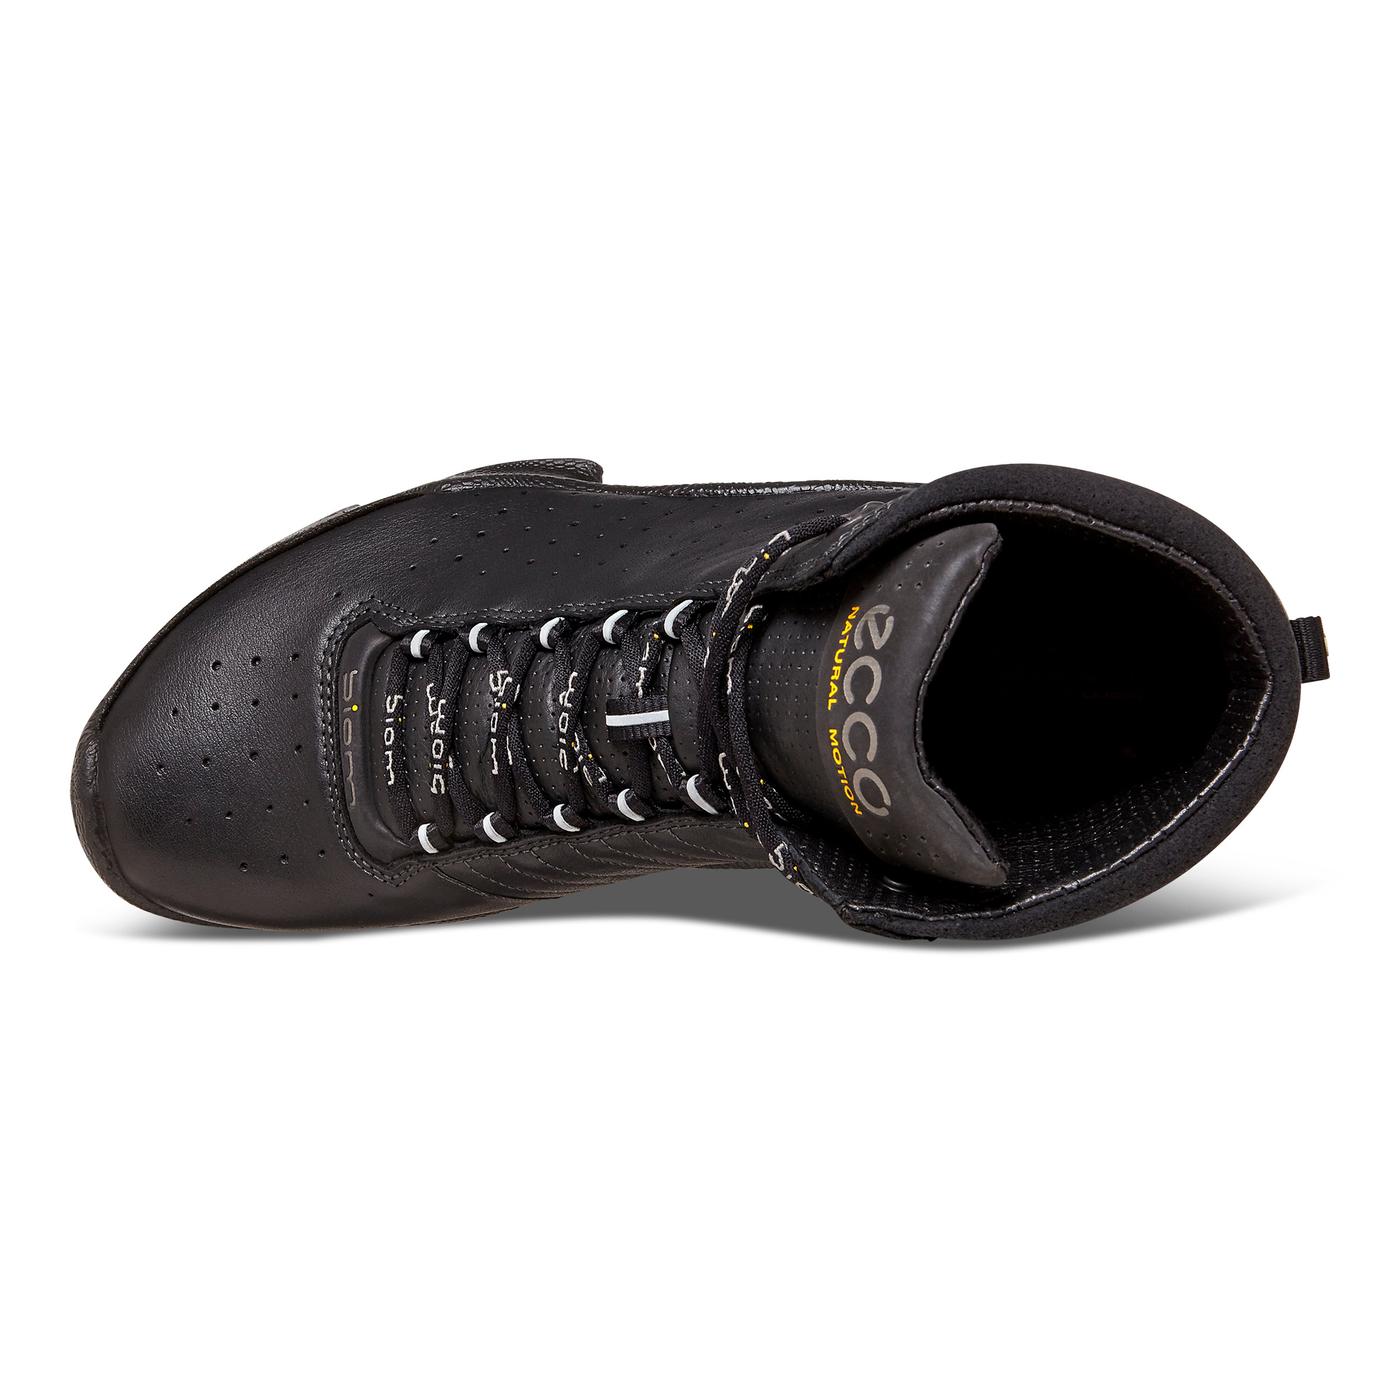 ECCO BIOM C - MEN'S Ankle Boot